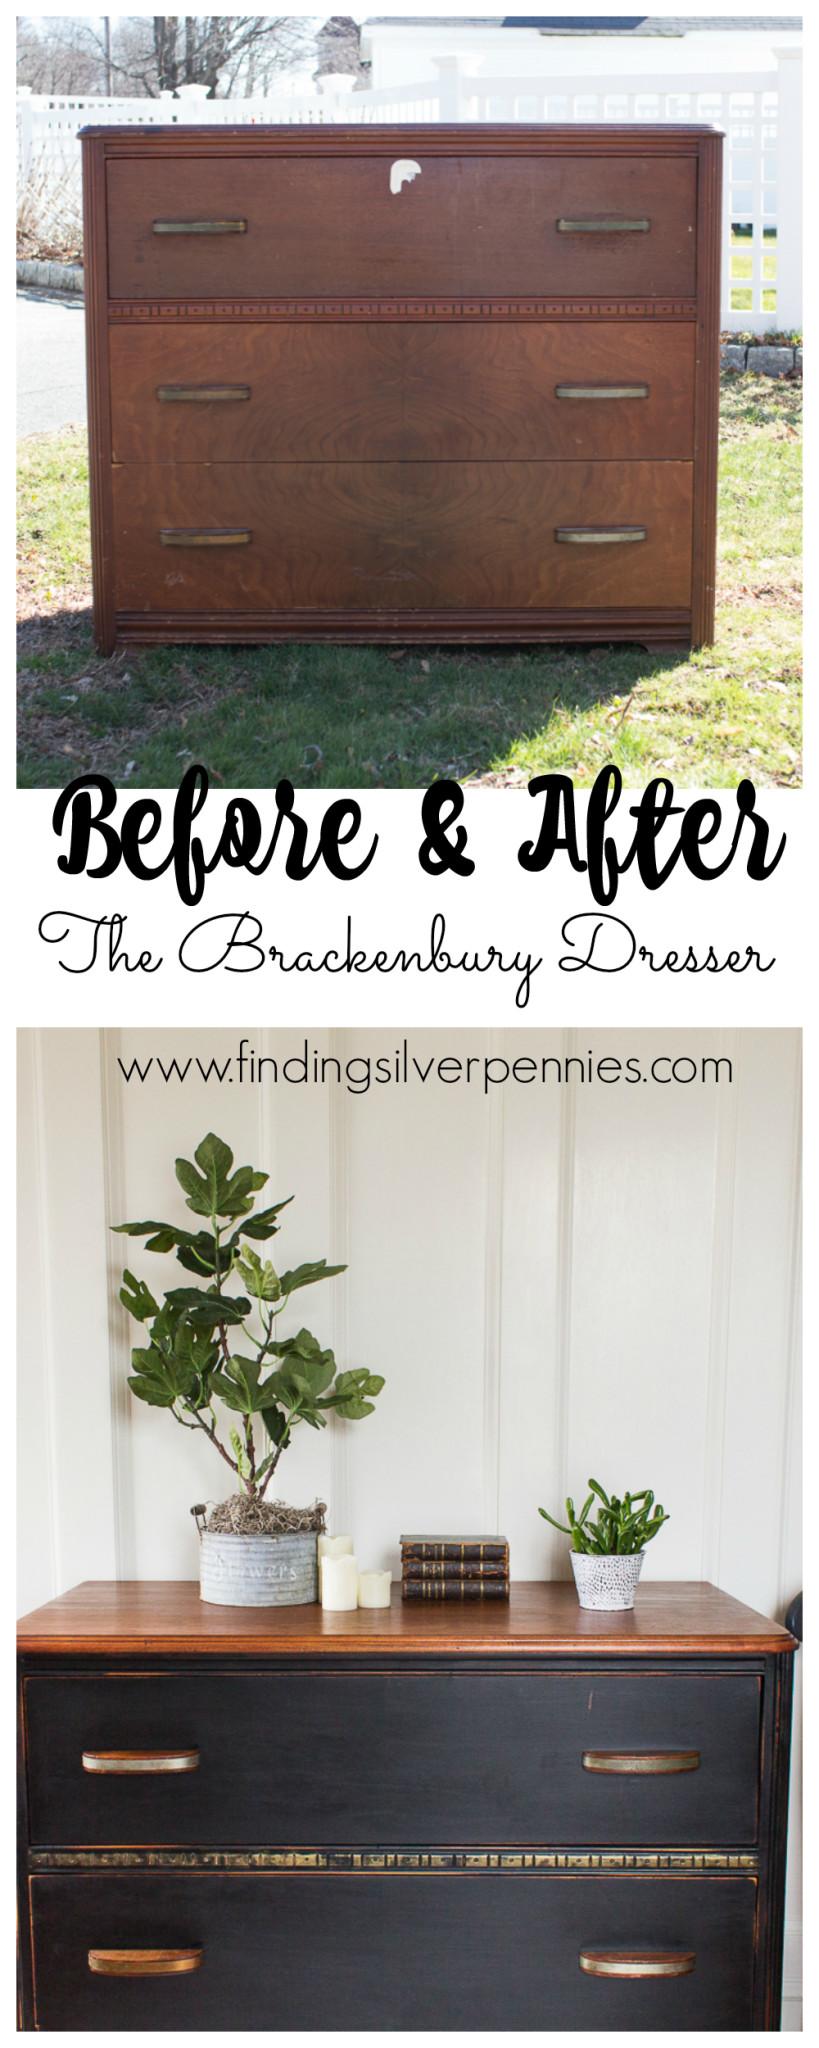 Before and after Brackenbury Dresser